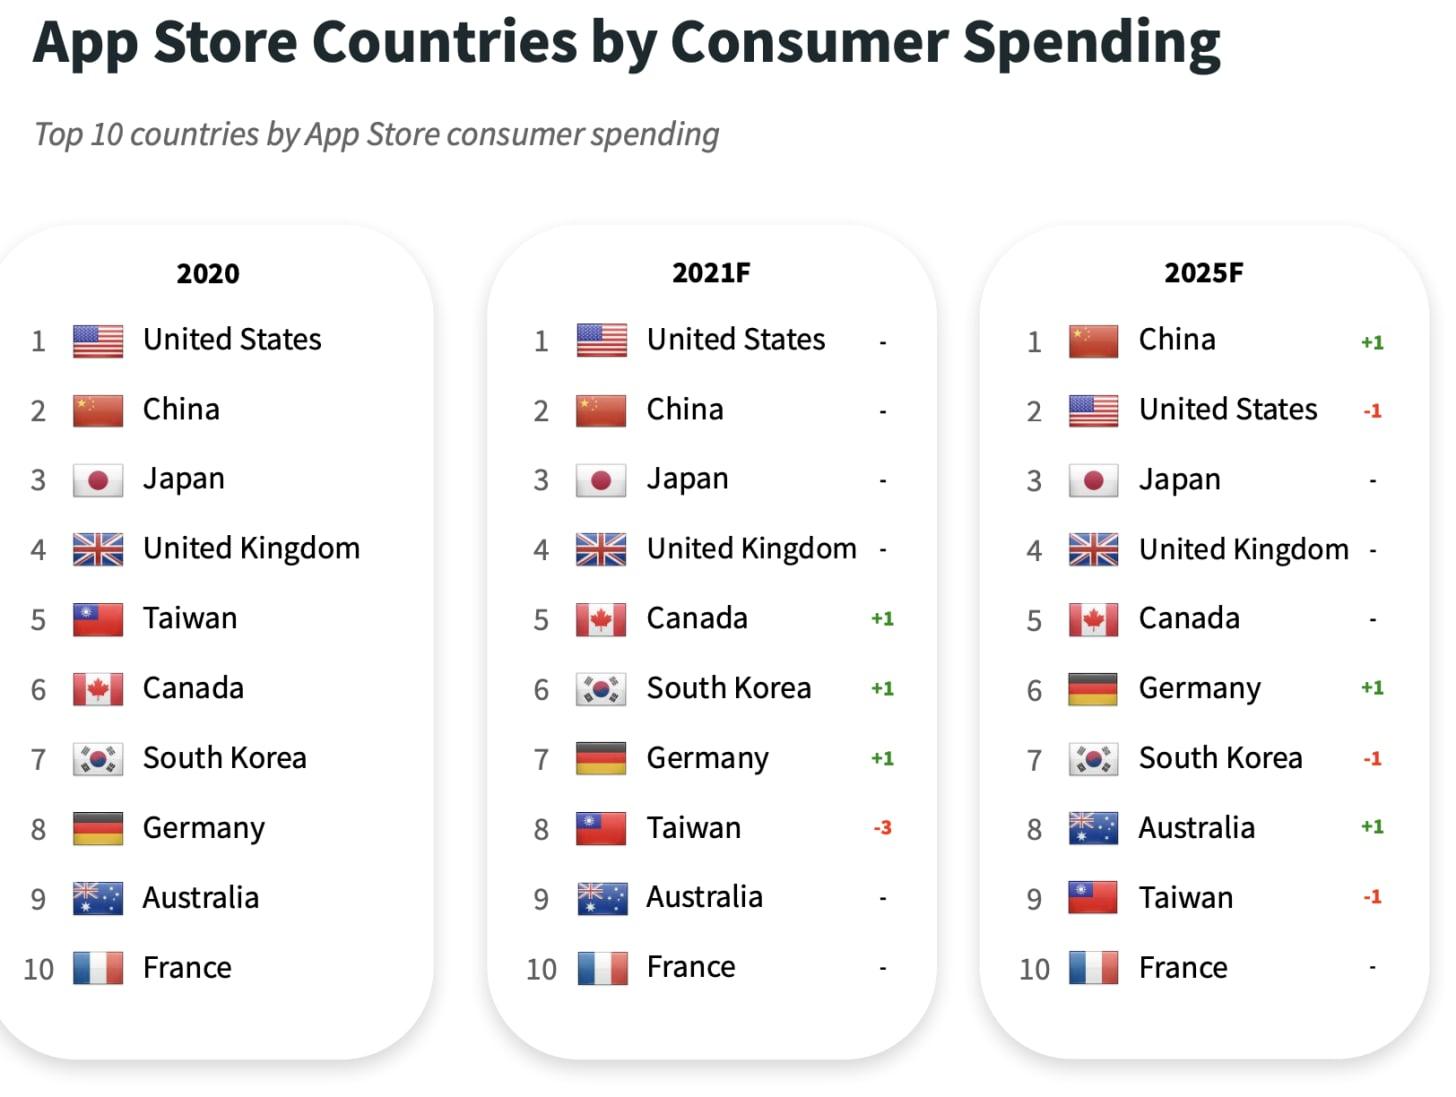 AppStore countries consumer spending forecast